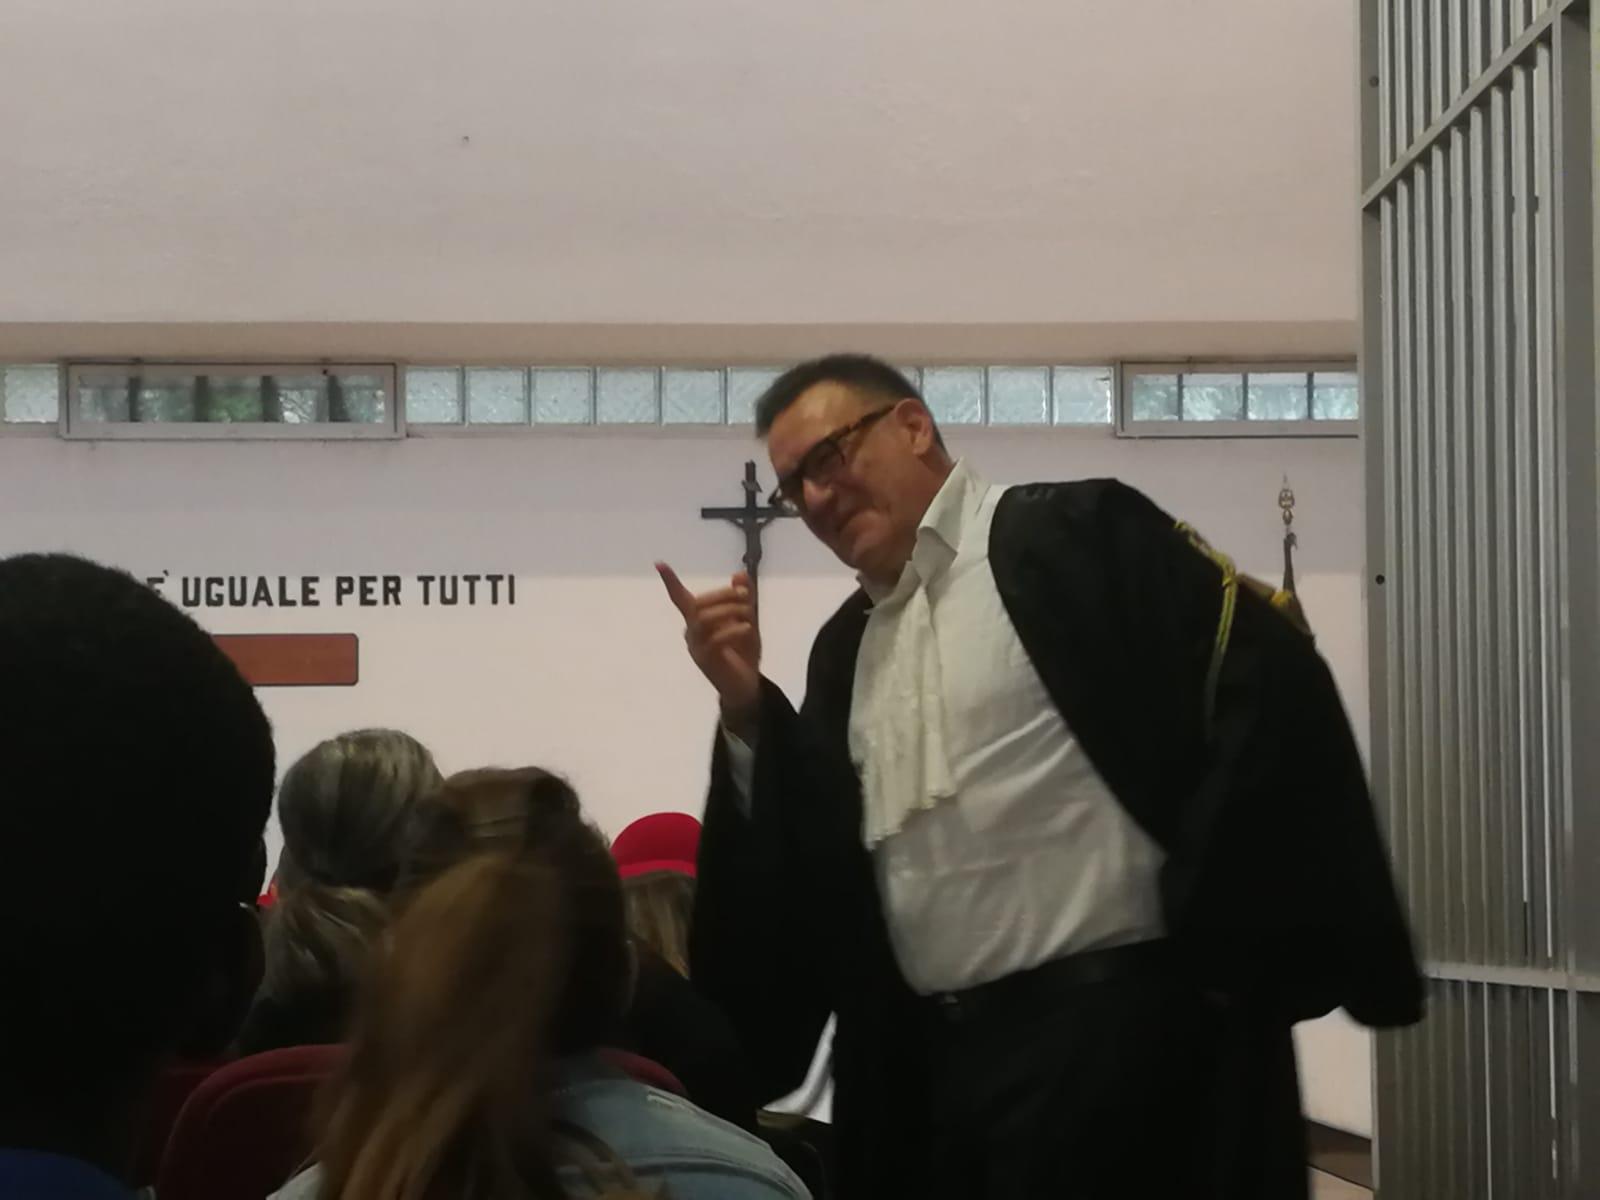 Sparatoria a Macerata, perizia psichiatrica su Luca Traini